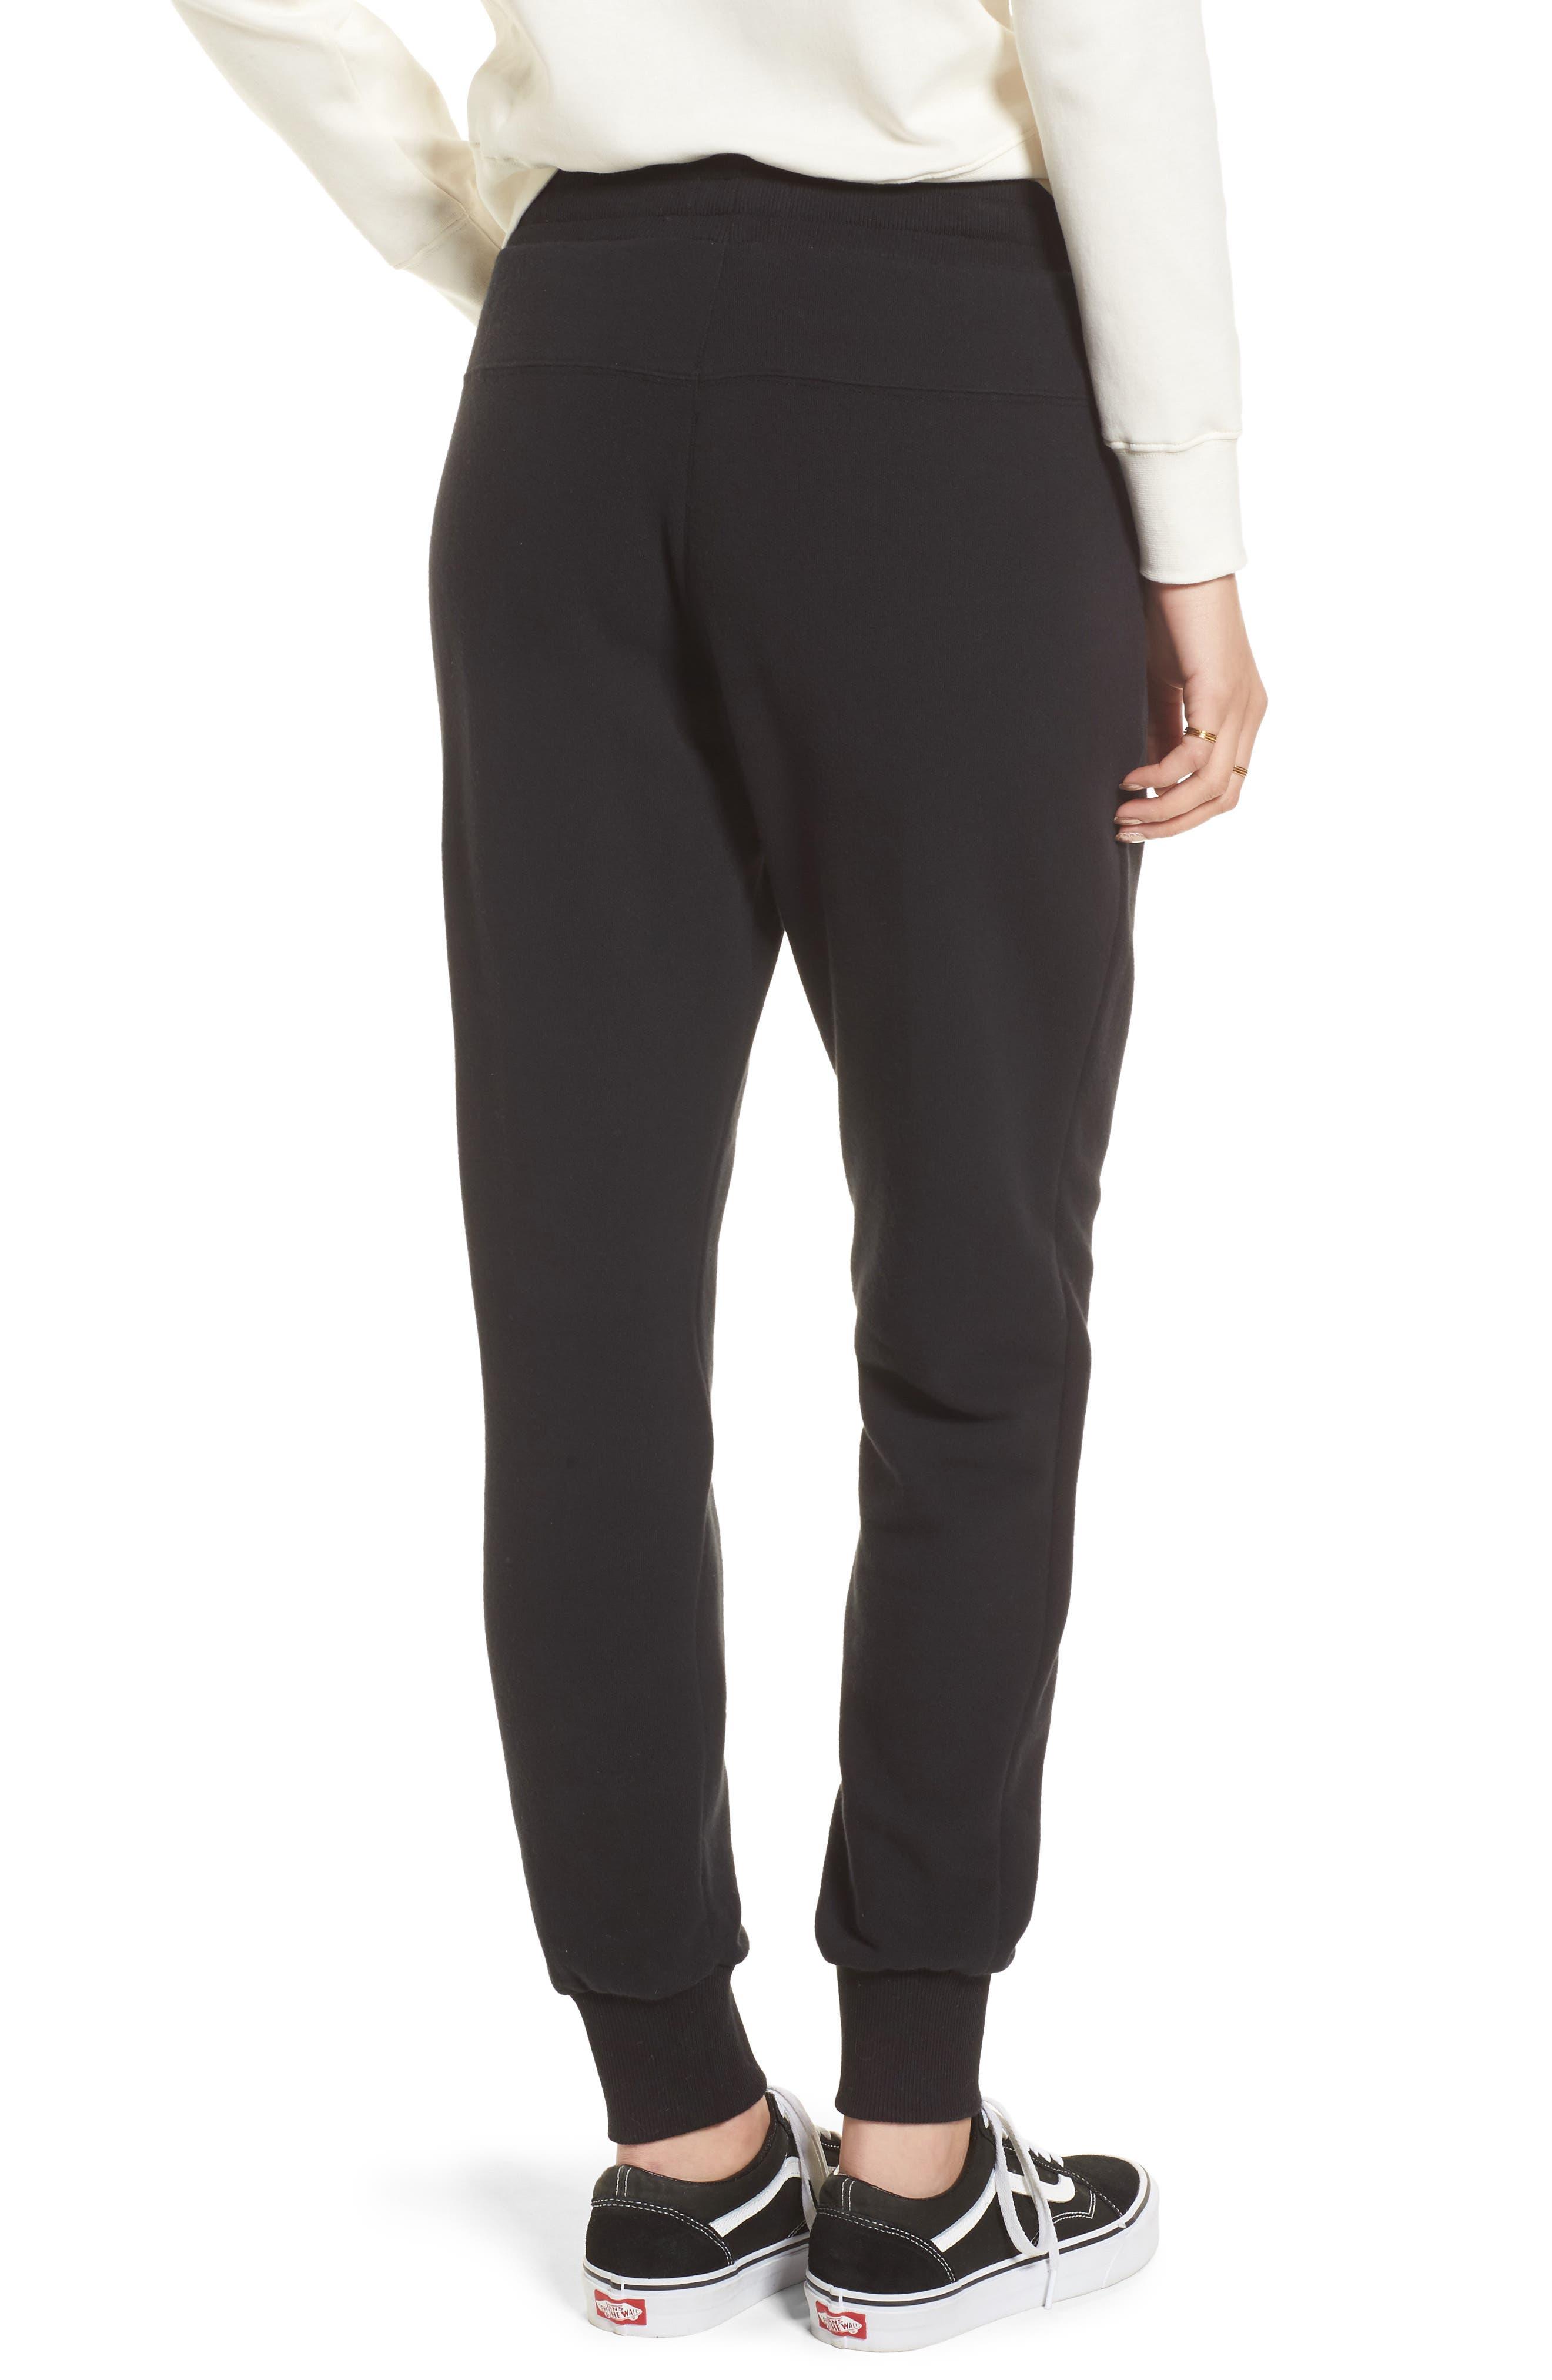 Terry Trouser Sweatpants,                             Alternate thumbnail 2, color,                             001